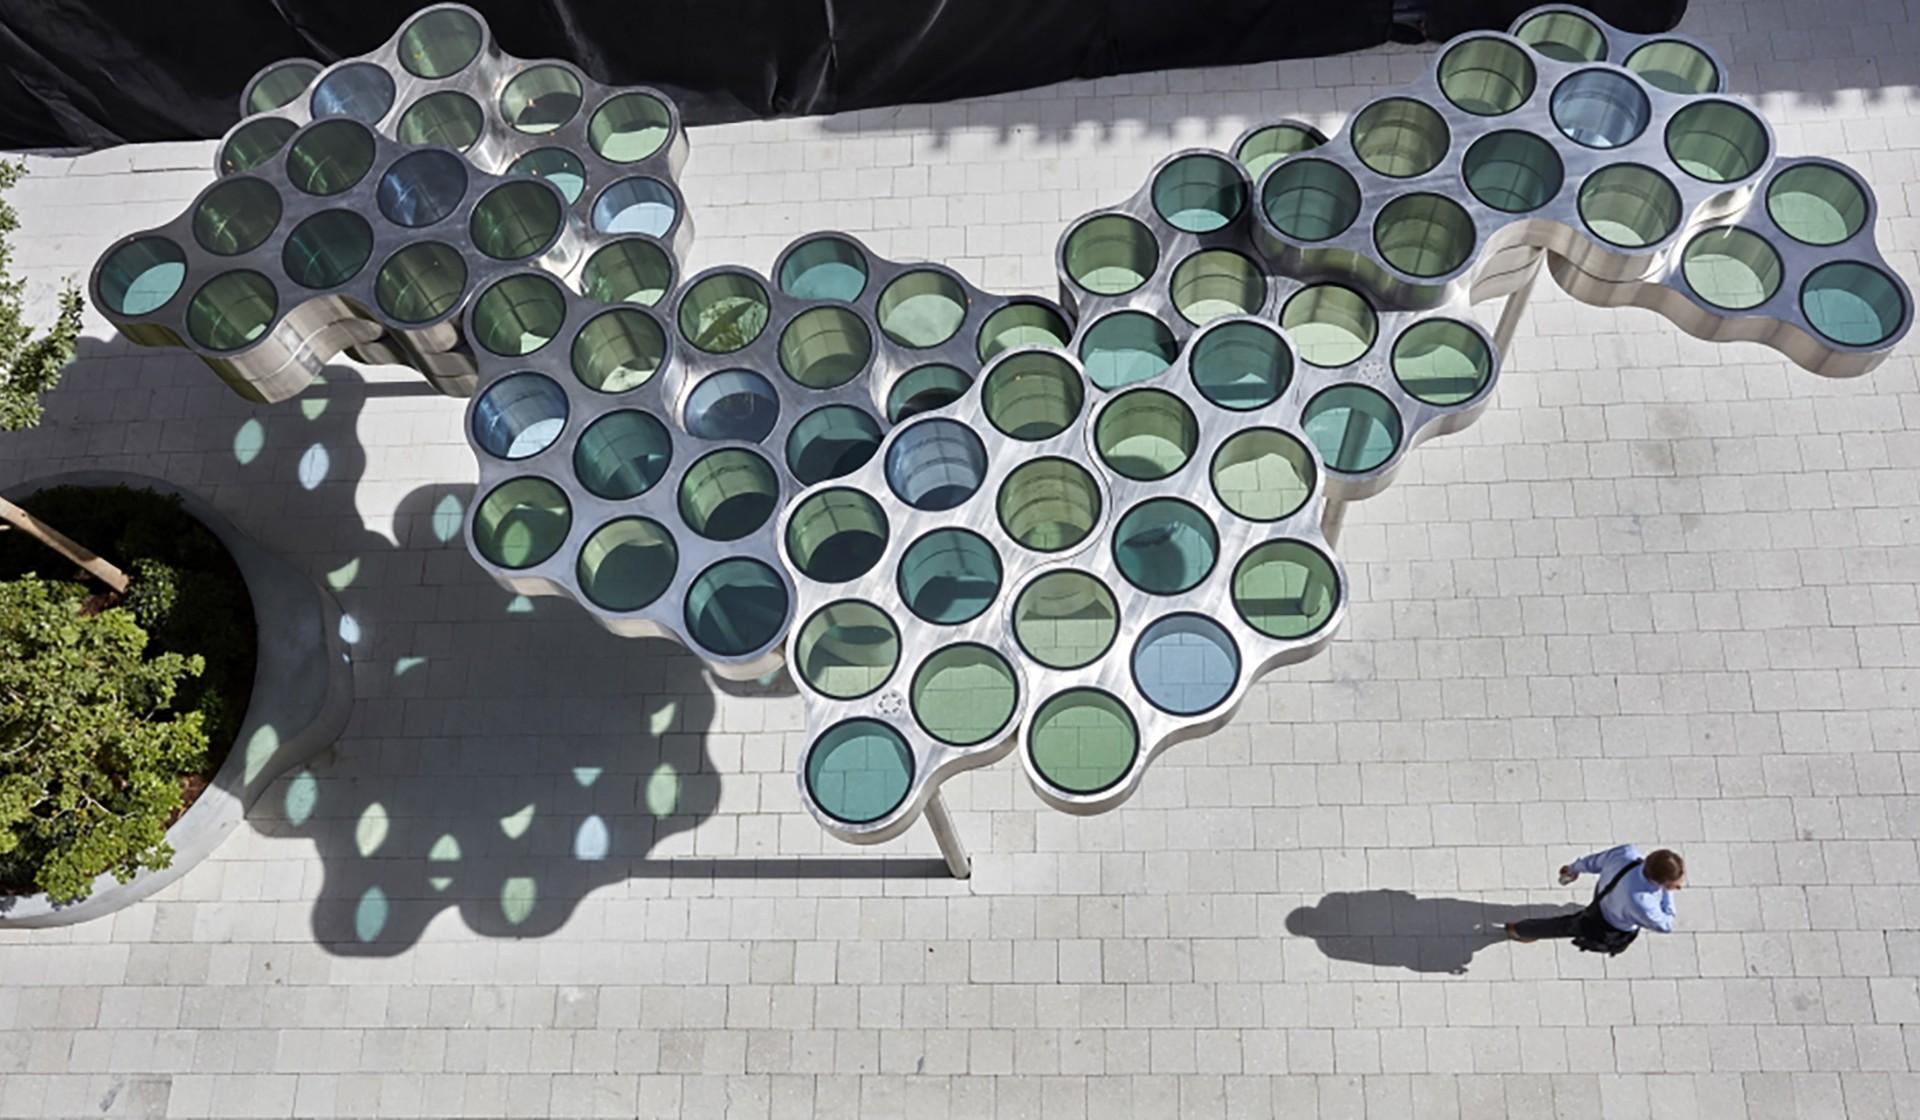 Ronan & Erwan Bouroullec ronan & erwan bouroullec: nuage, 2017 public art in miami